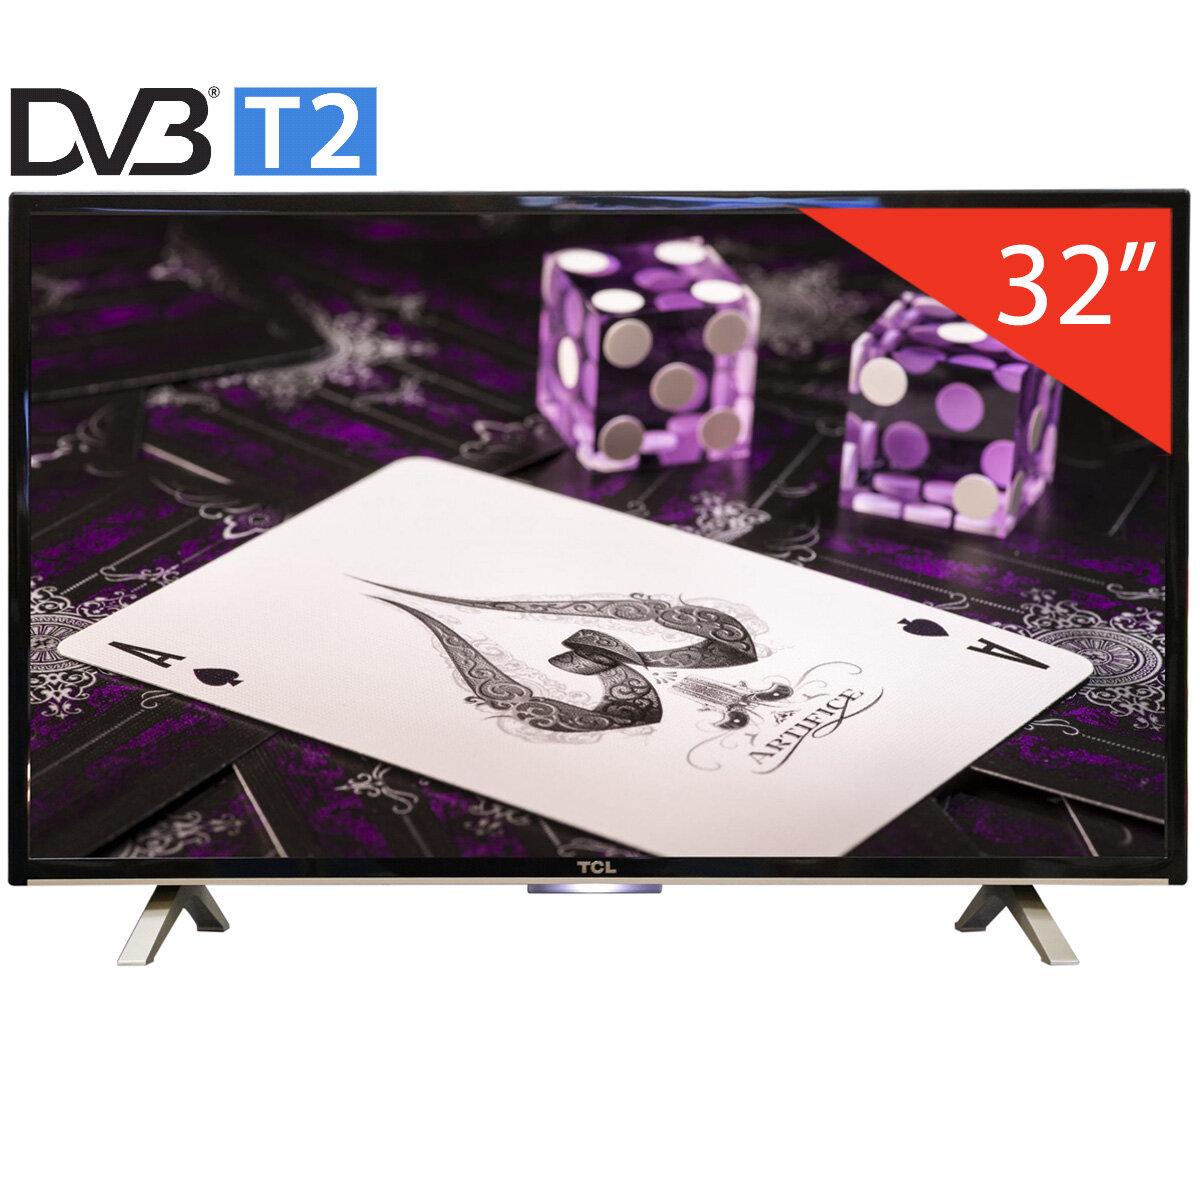 Smart Tivi LED TCL L32D2790 - 32 inch, HD (1366x768)